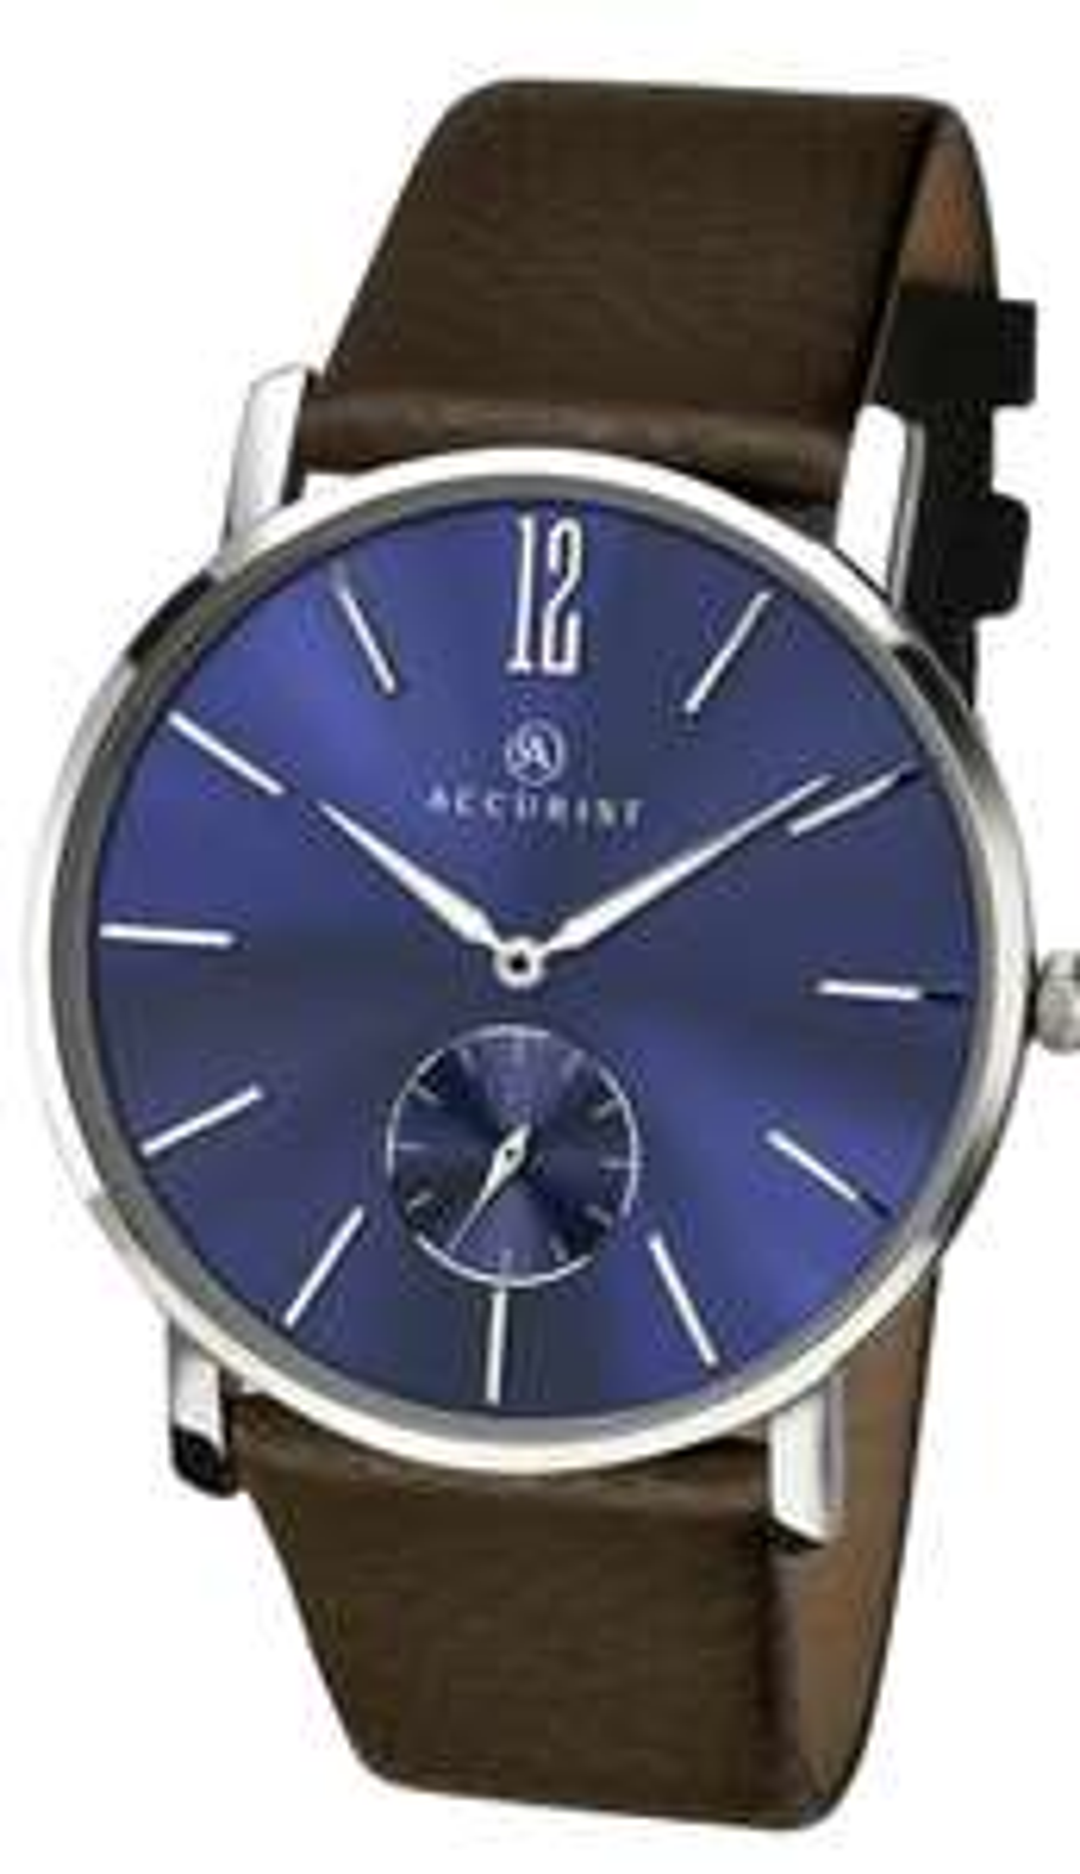 Accurist Men's Brown Leather Strap Watch £24.99 + £3.95 del at Argos